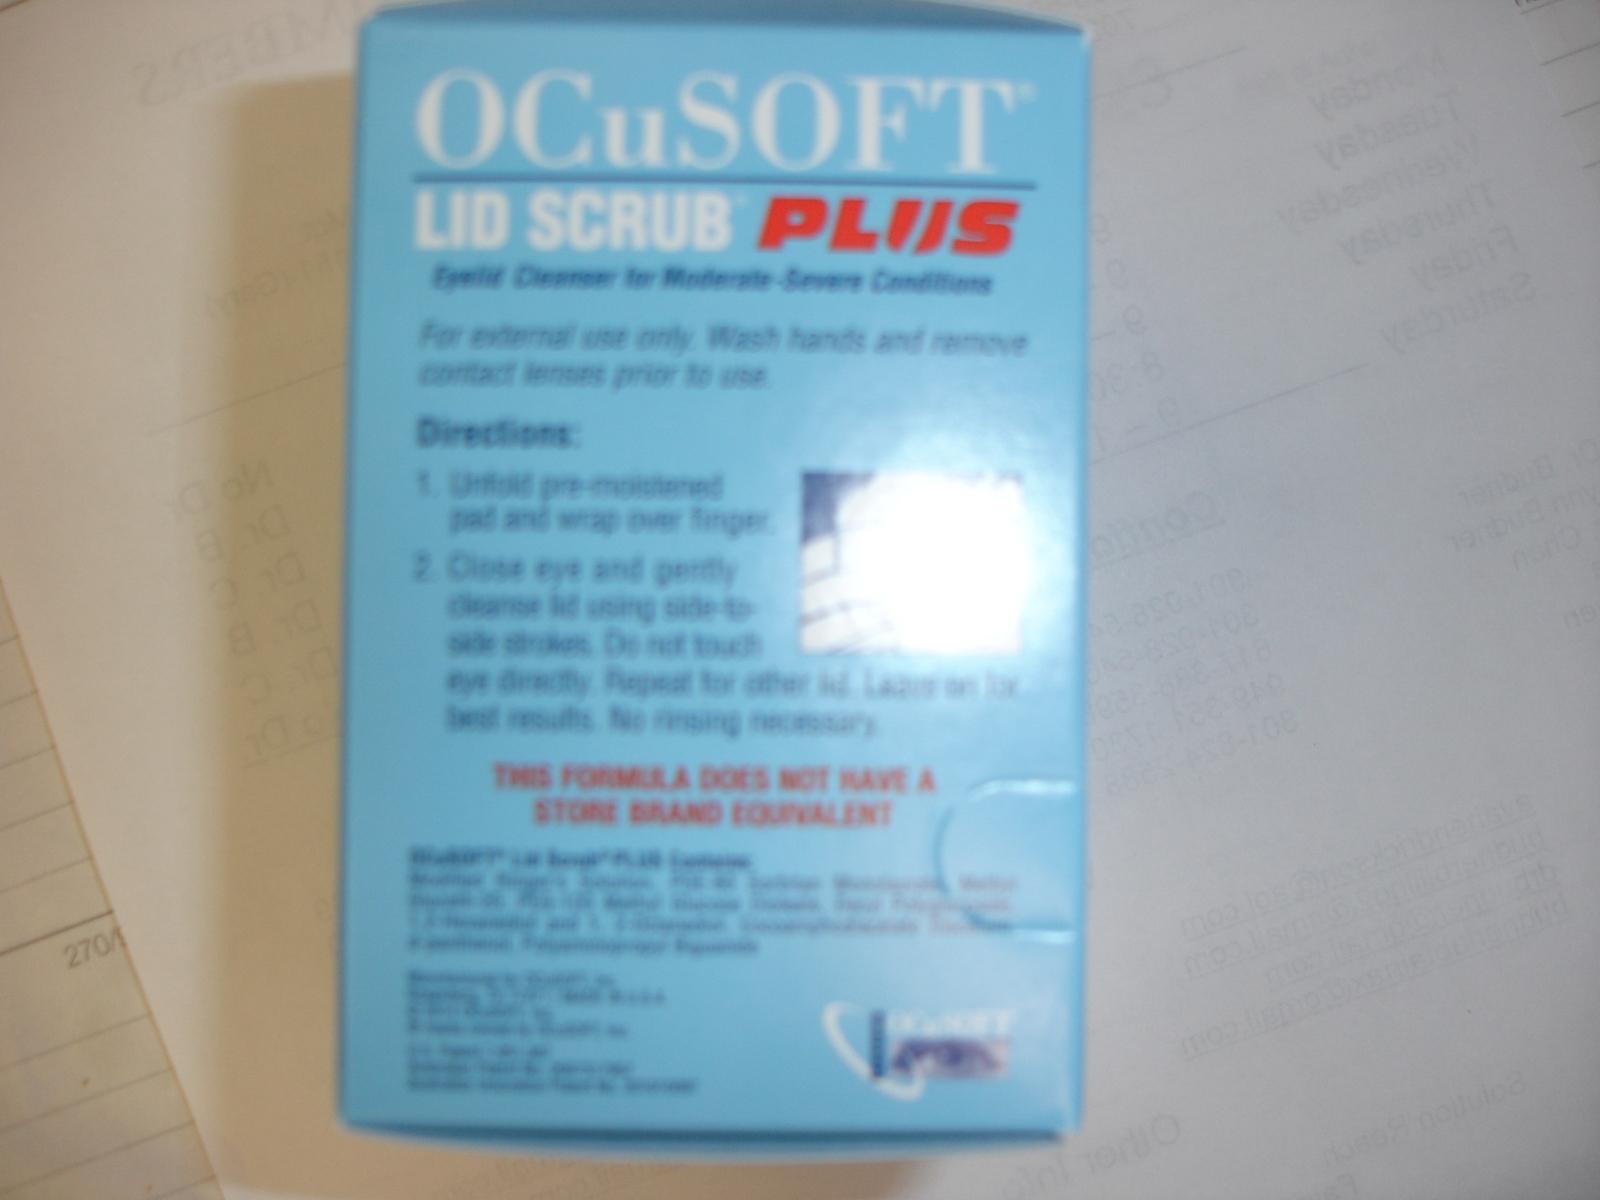 Ocusoft PLUS lid scrub pre moistened pads 60ct 2 pk  ($2.00 rebate)